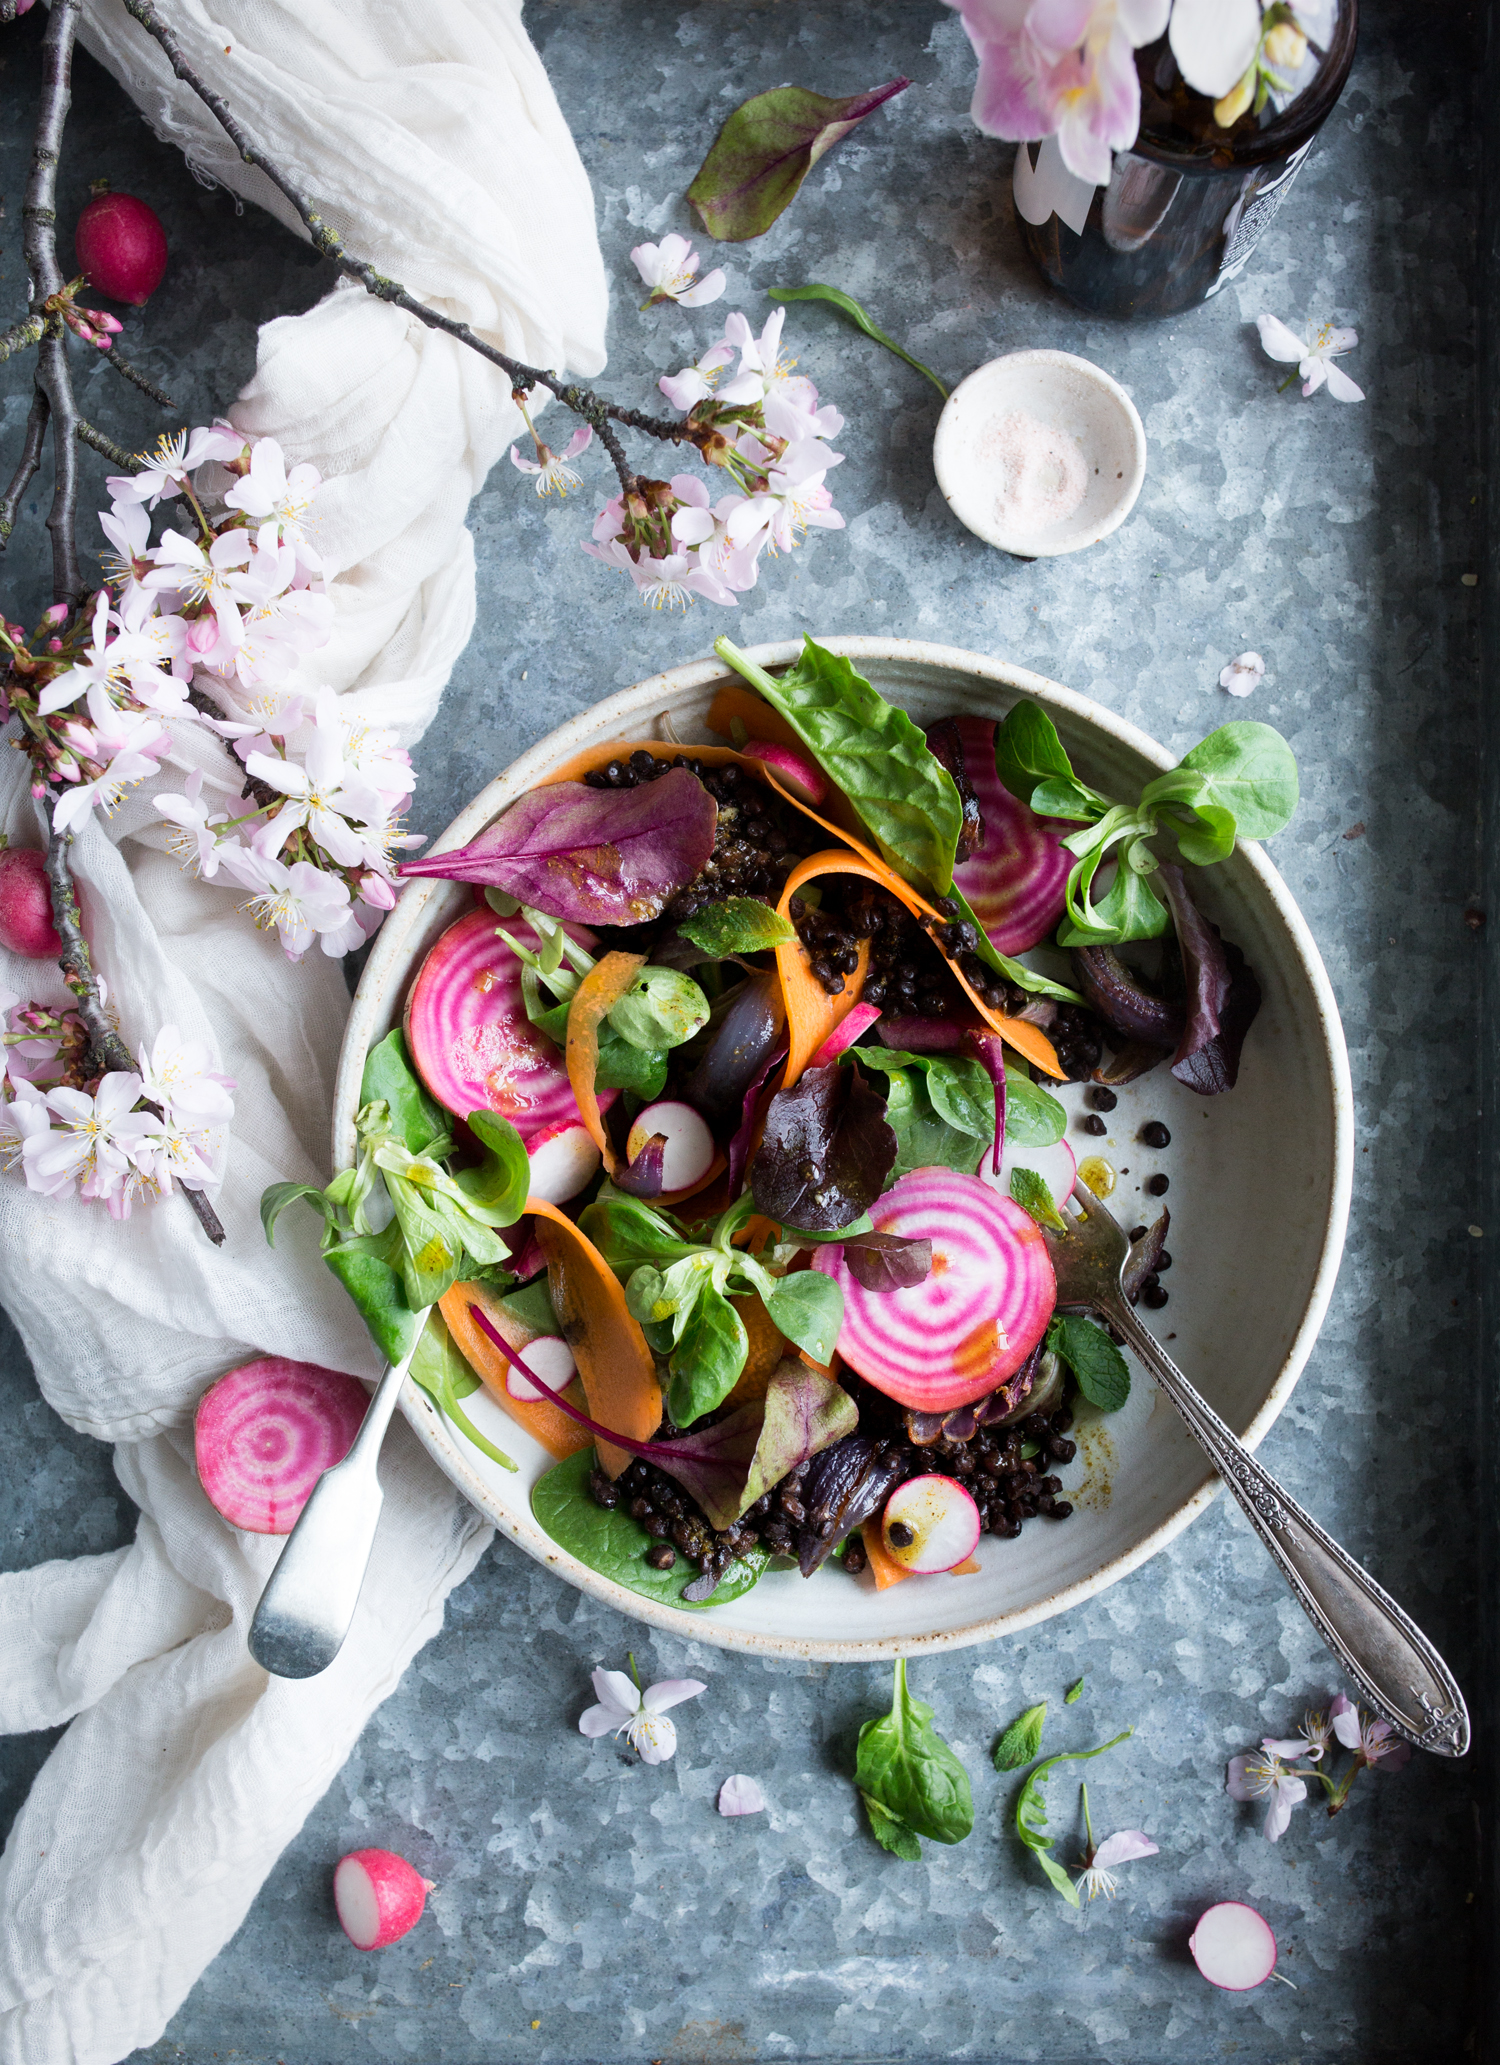 Protein rich vegan lentil salad recipe